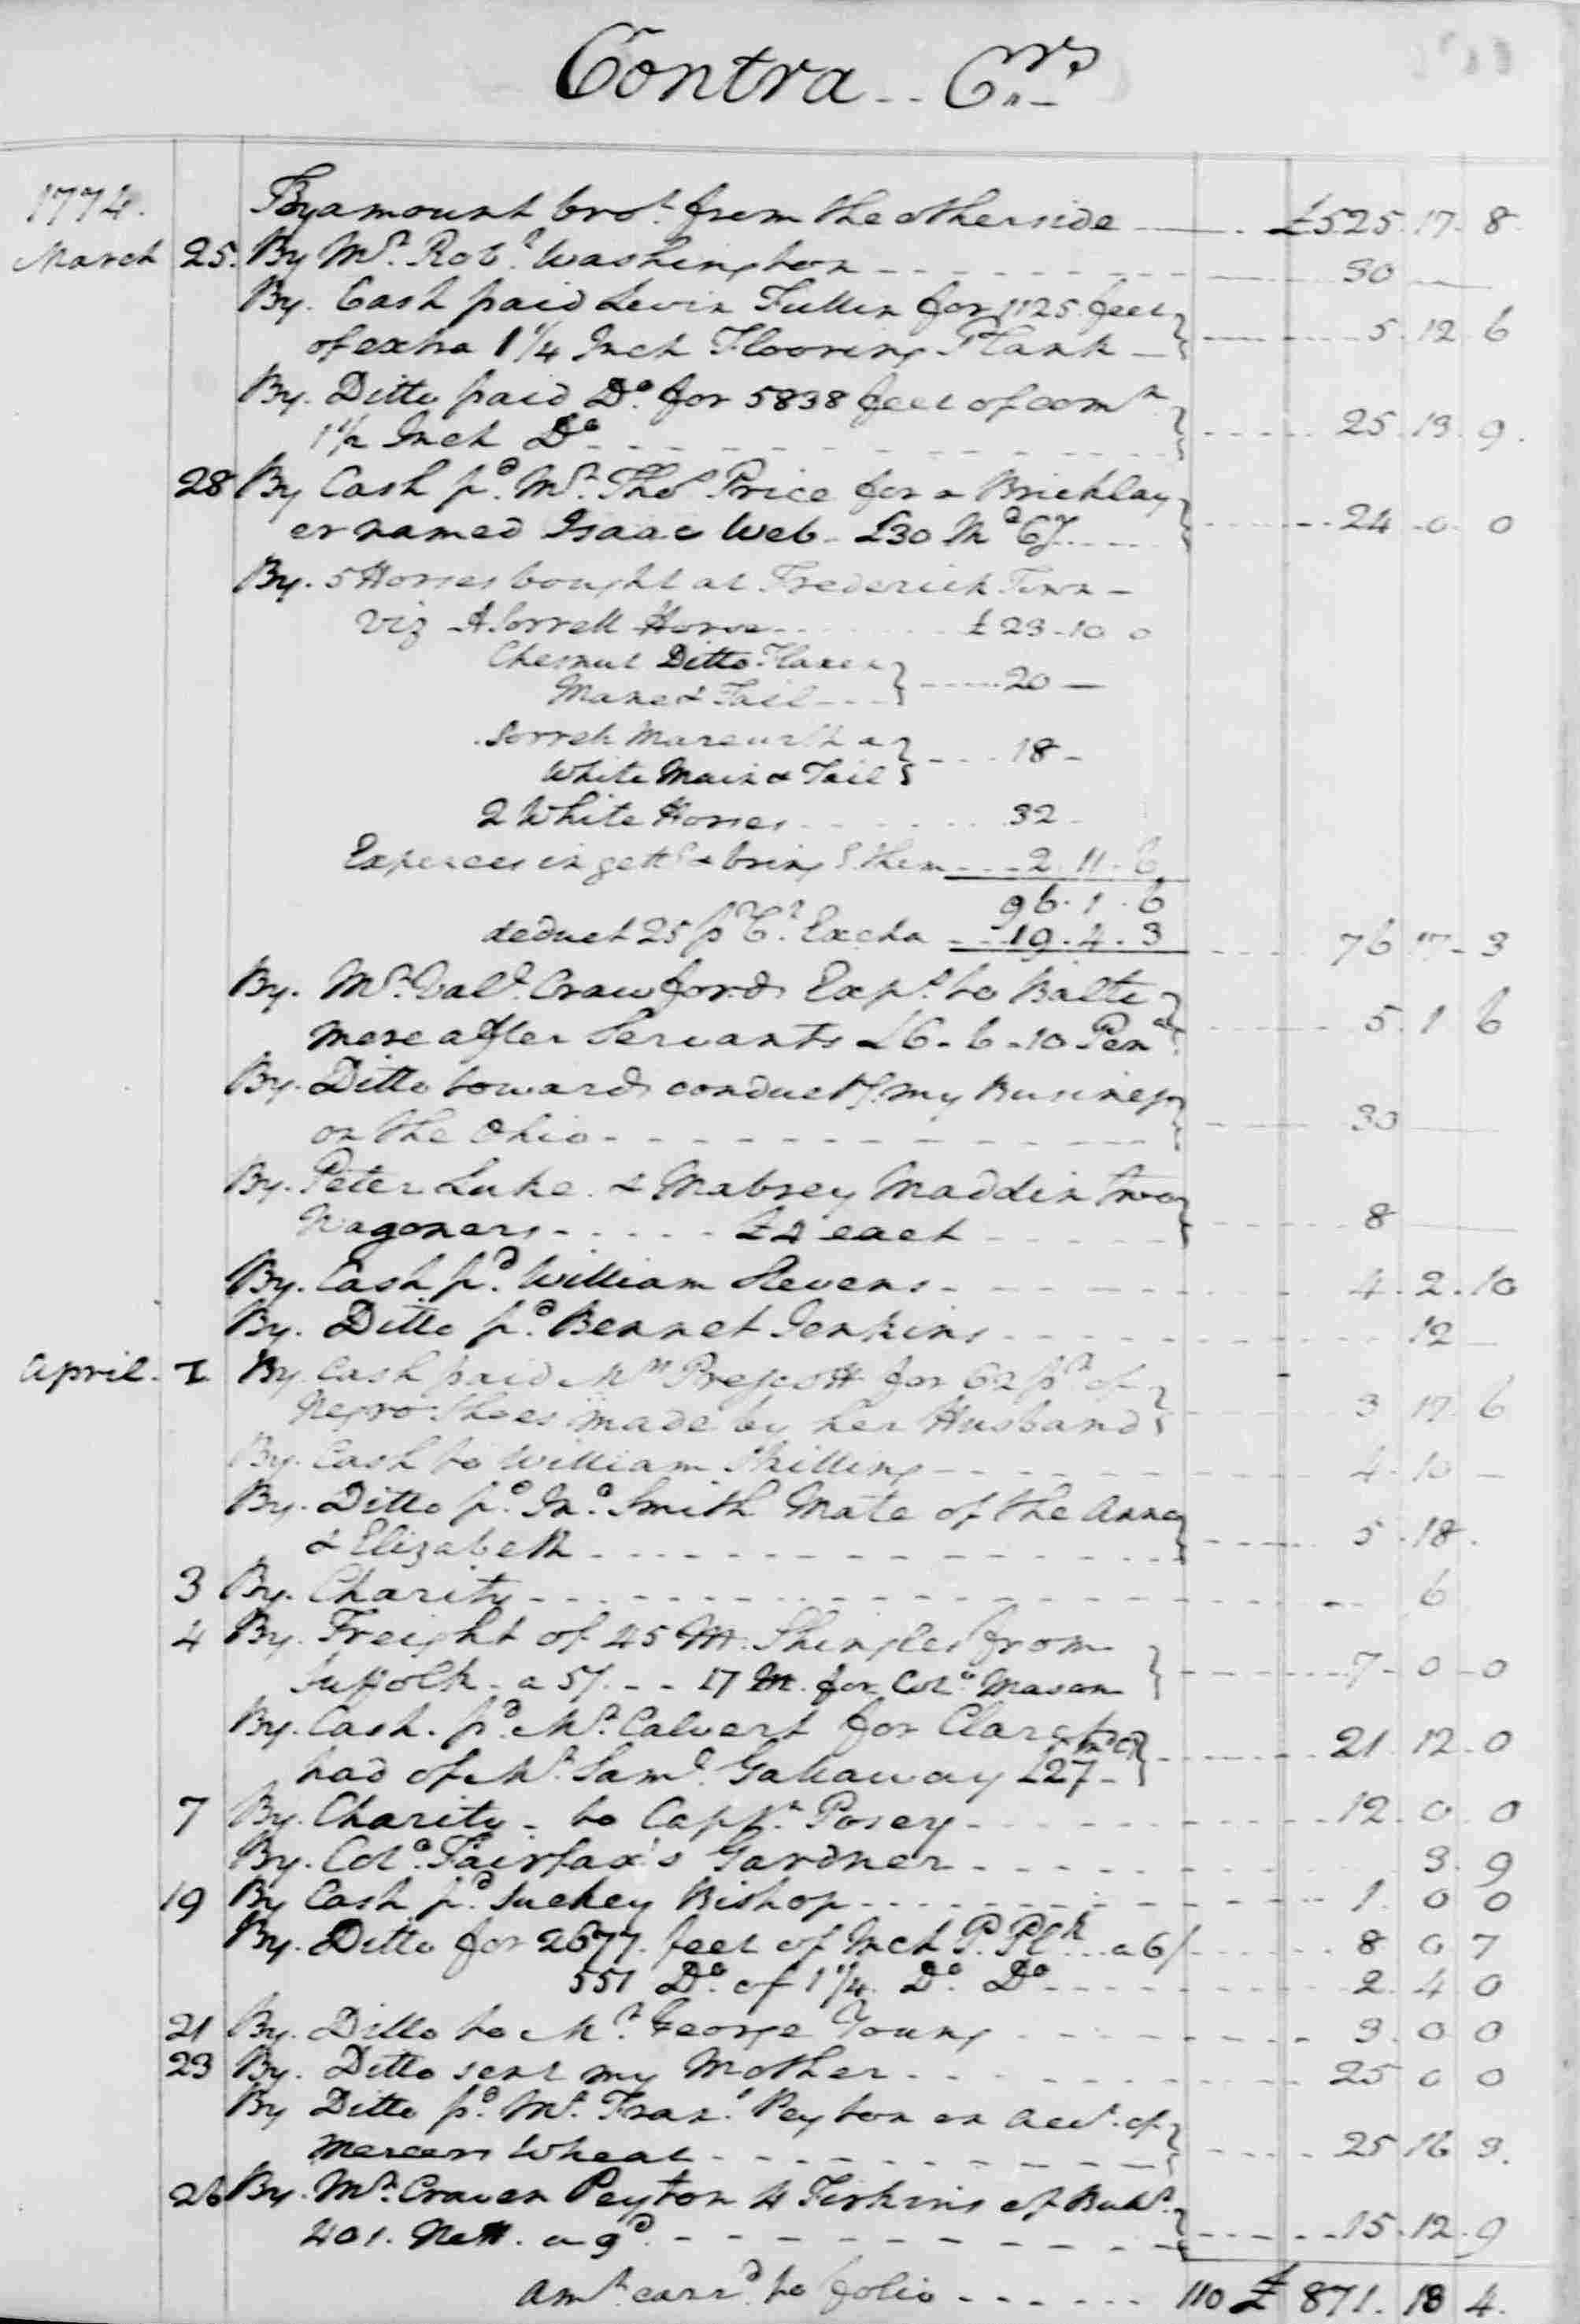 Ledger B, folio 106, right side